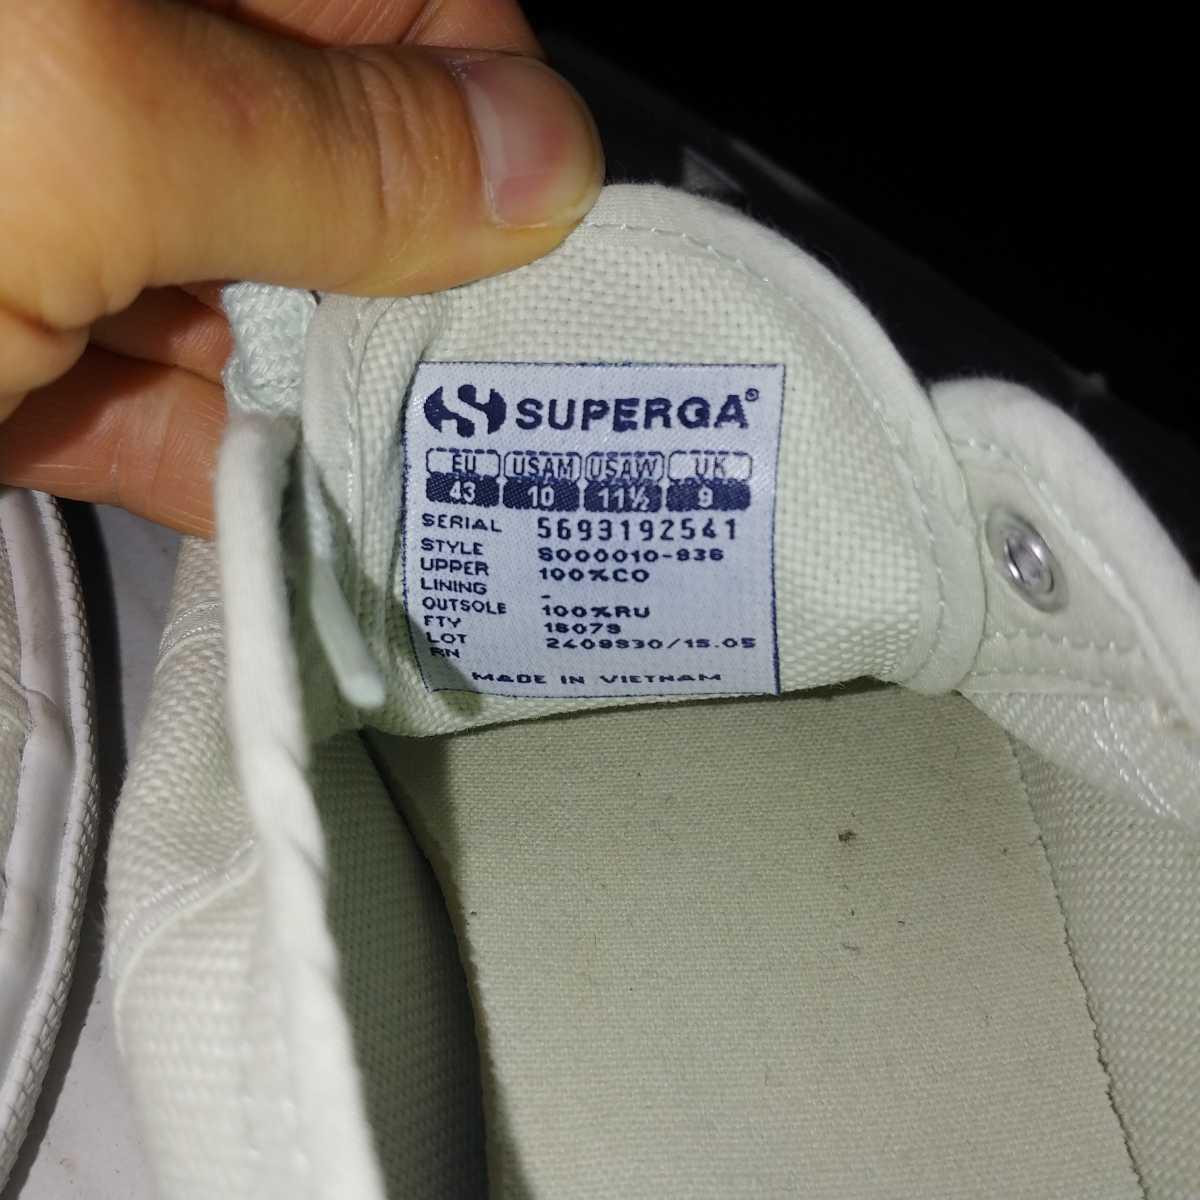 SUPERGA スペルガ キャンバス スニーカー size 43 28cm_画像5